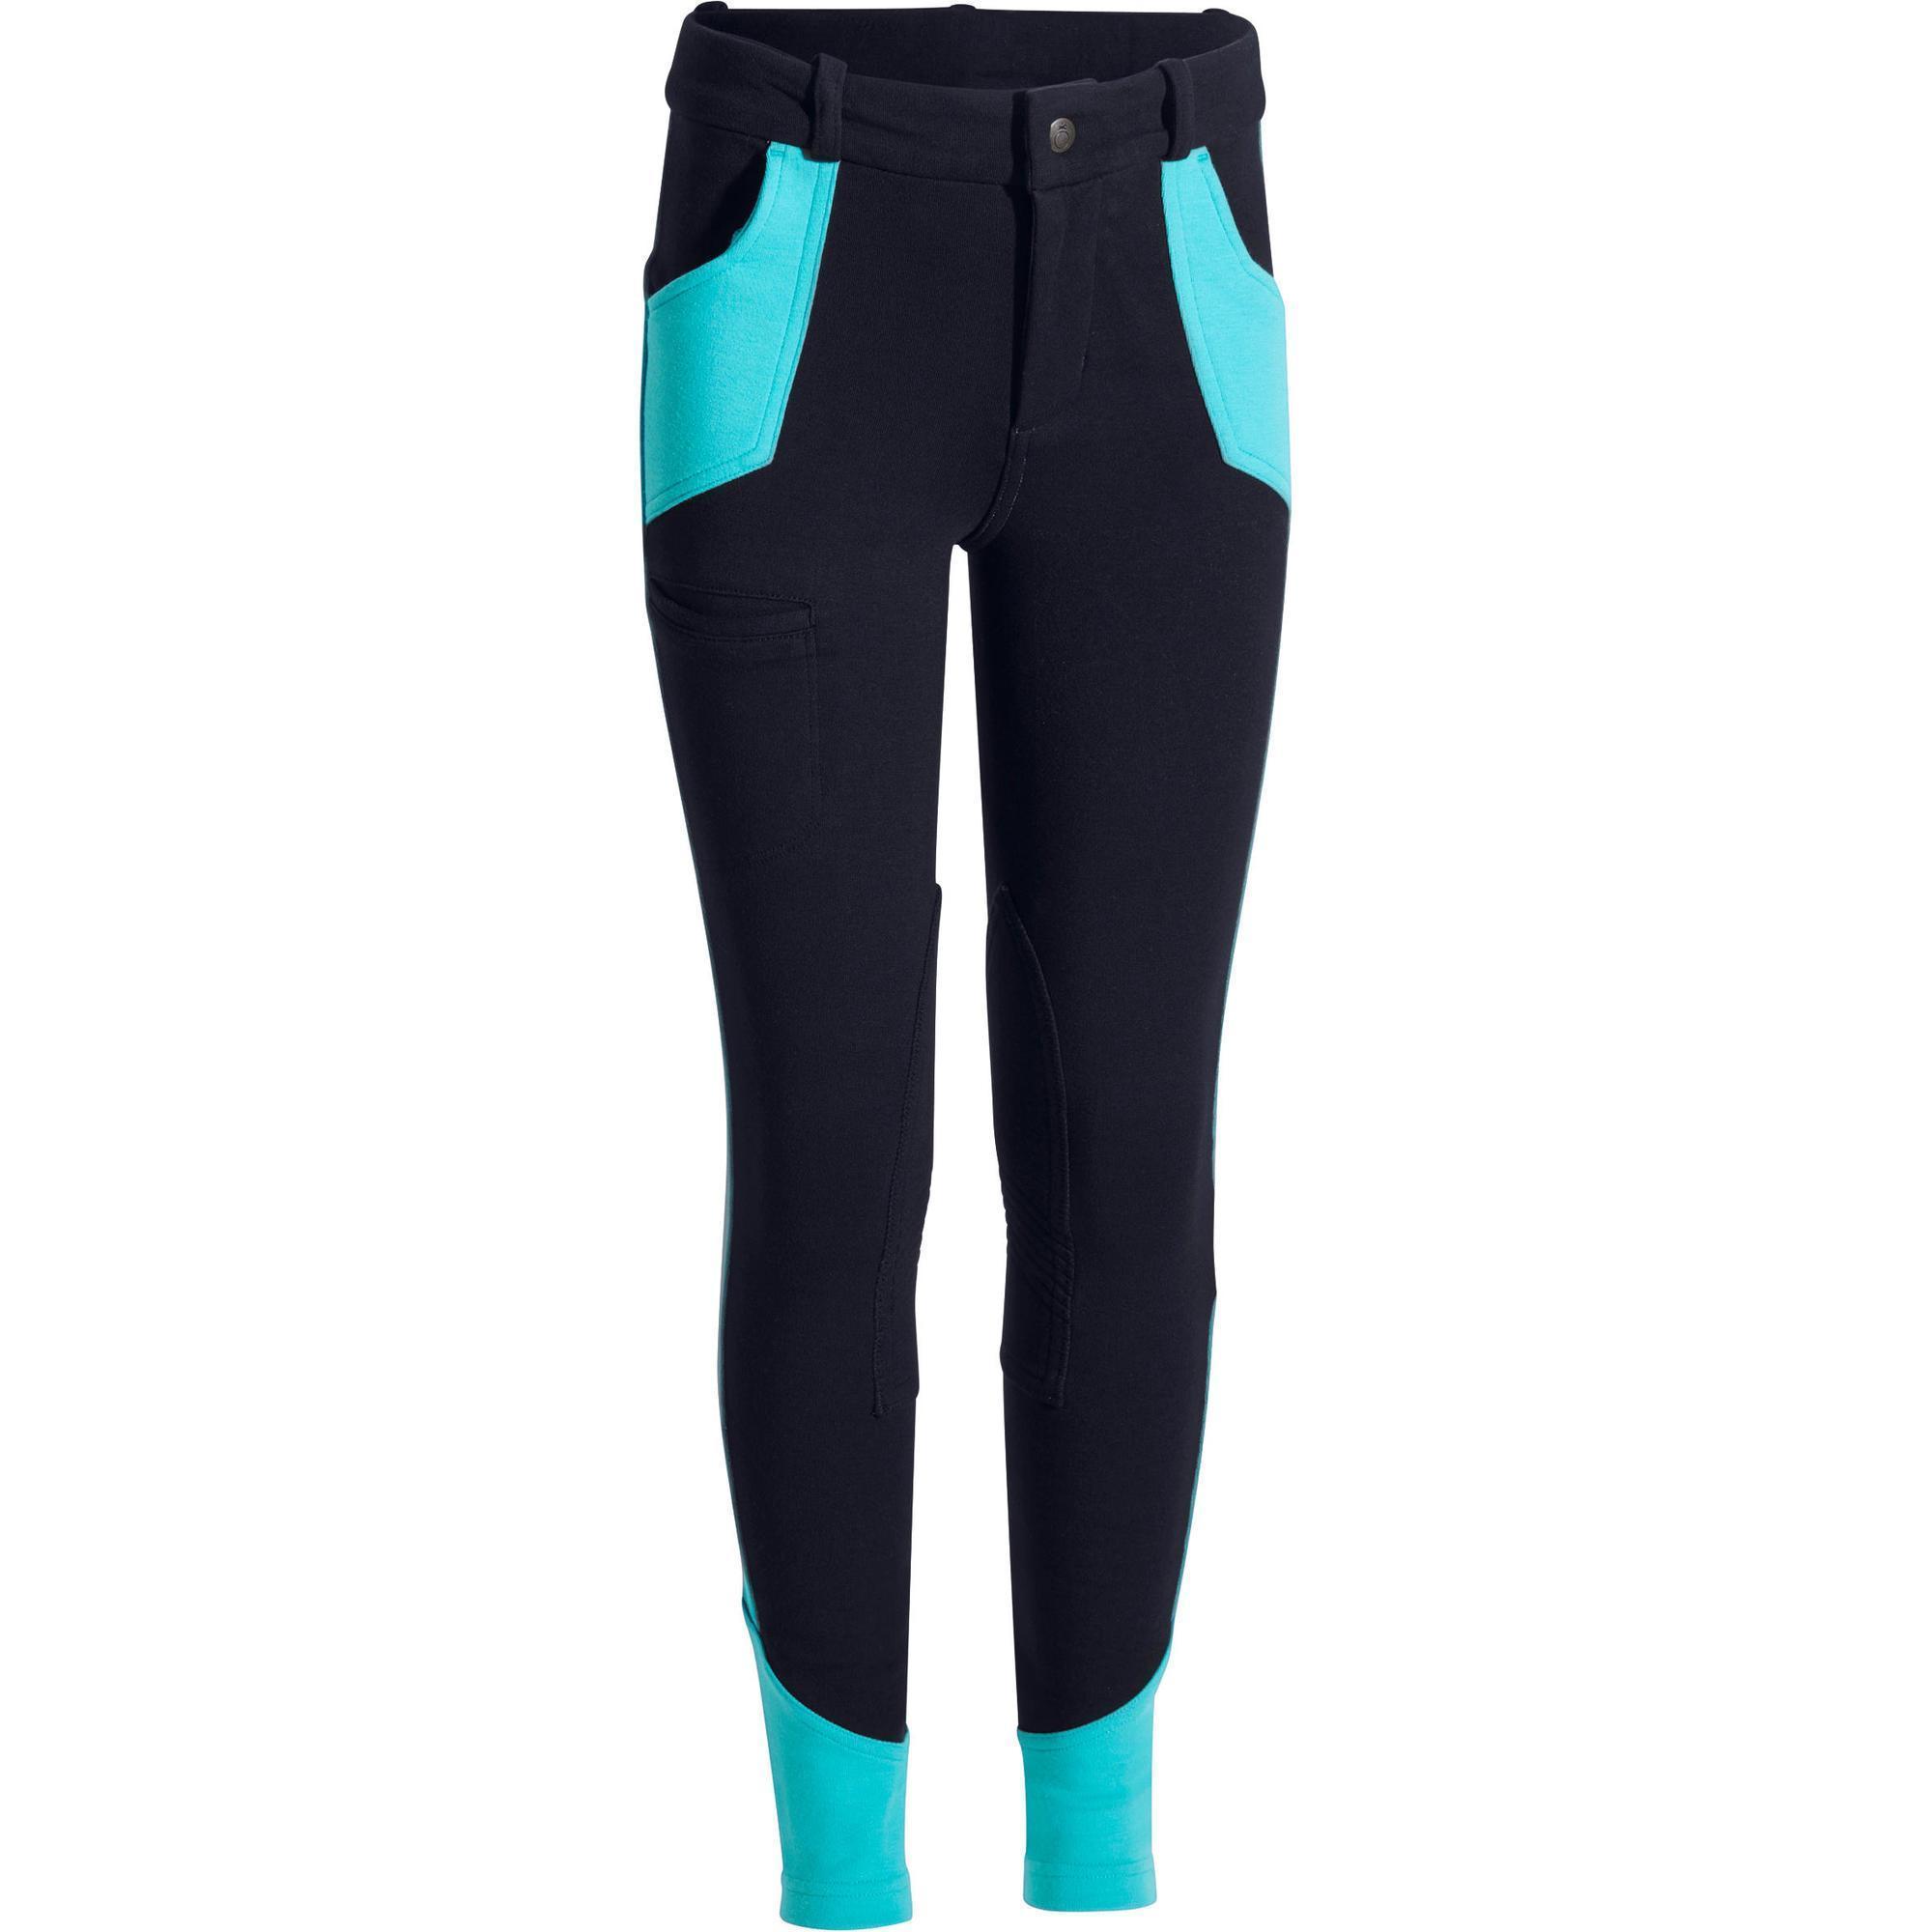 pantalon quitation enfant bicolo bleu marine bleu. Black Bedroom Furniture Sets. Home Design Ideas